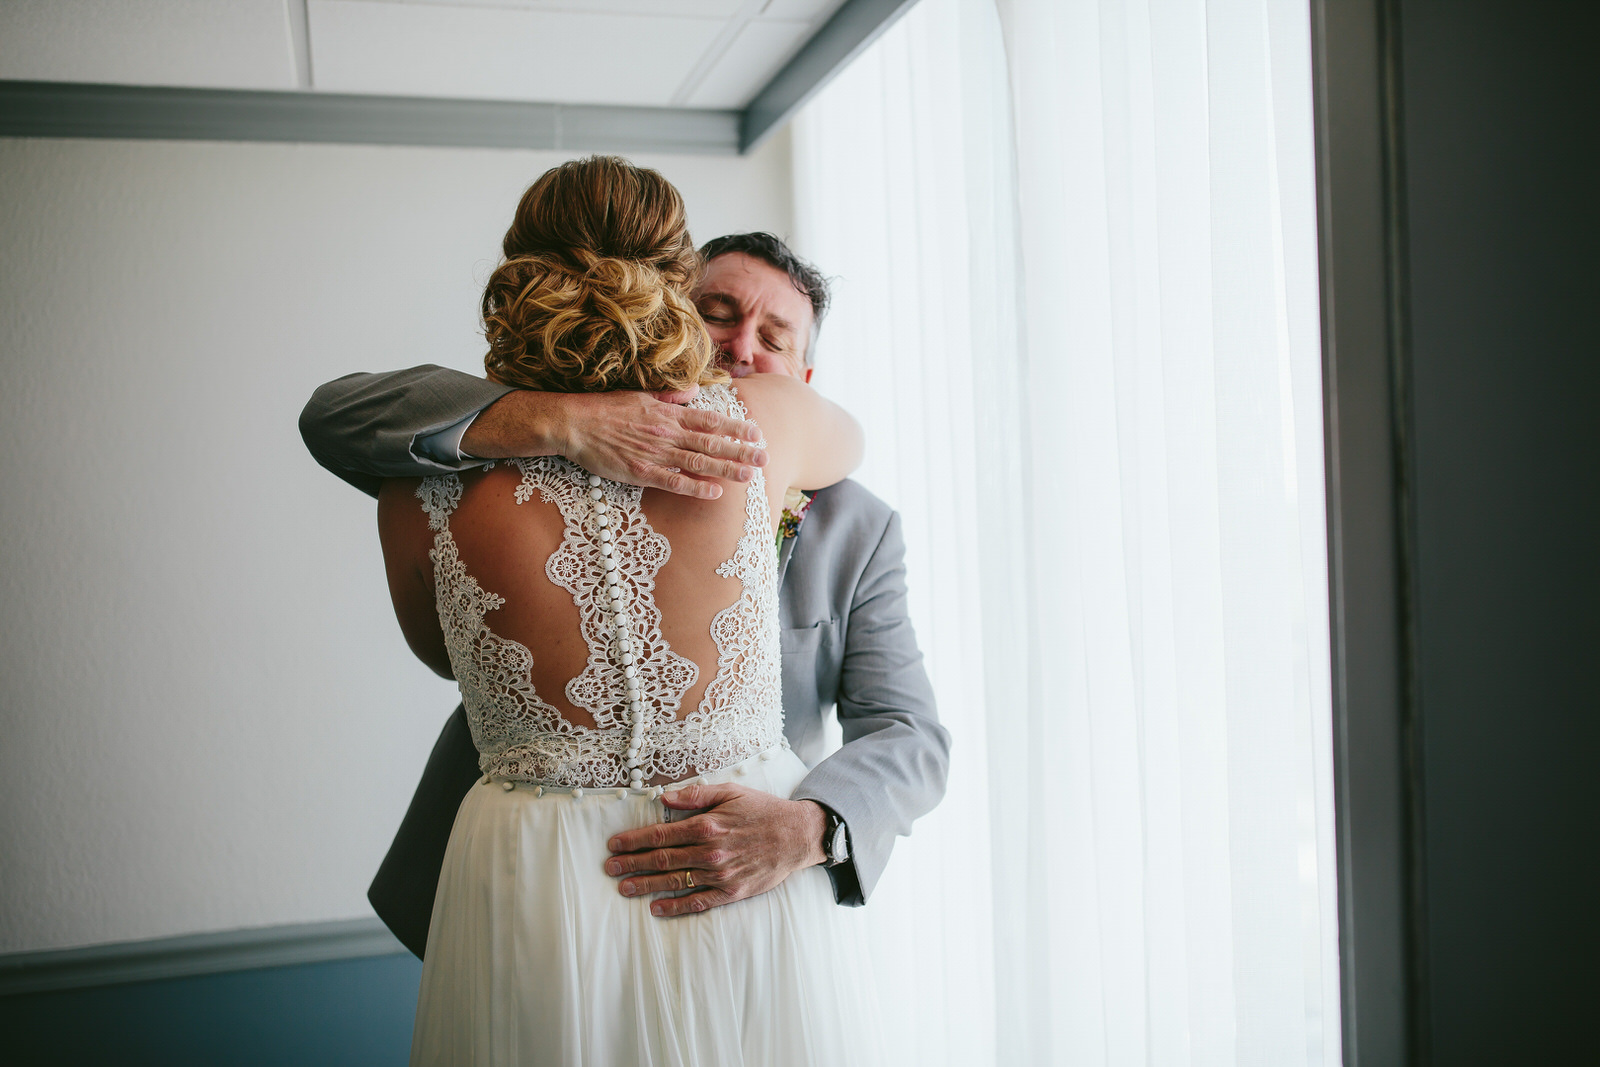 father_daughter_first_look_destination_wedding_lgbtq.jpg